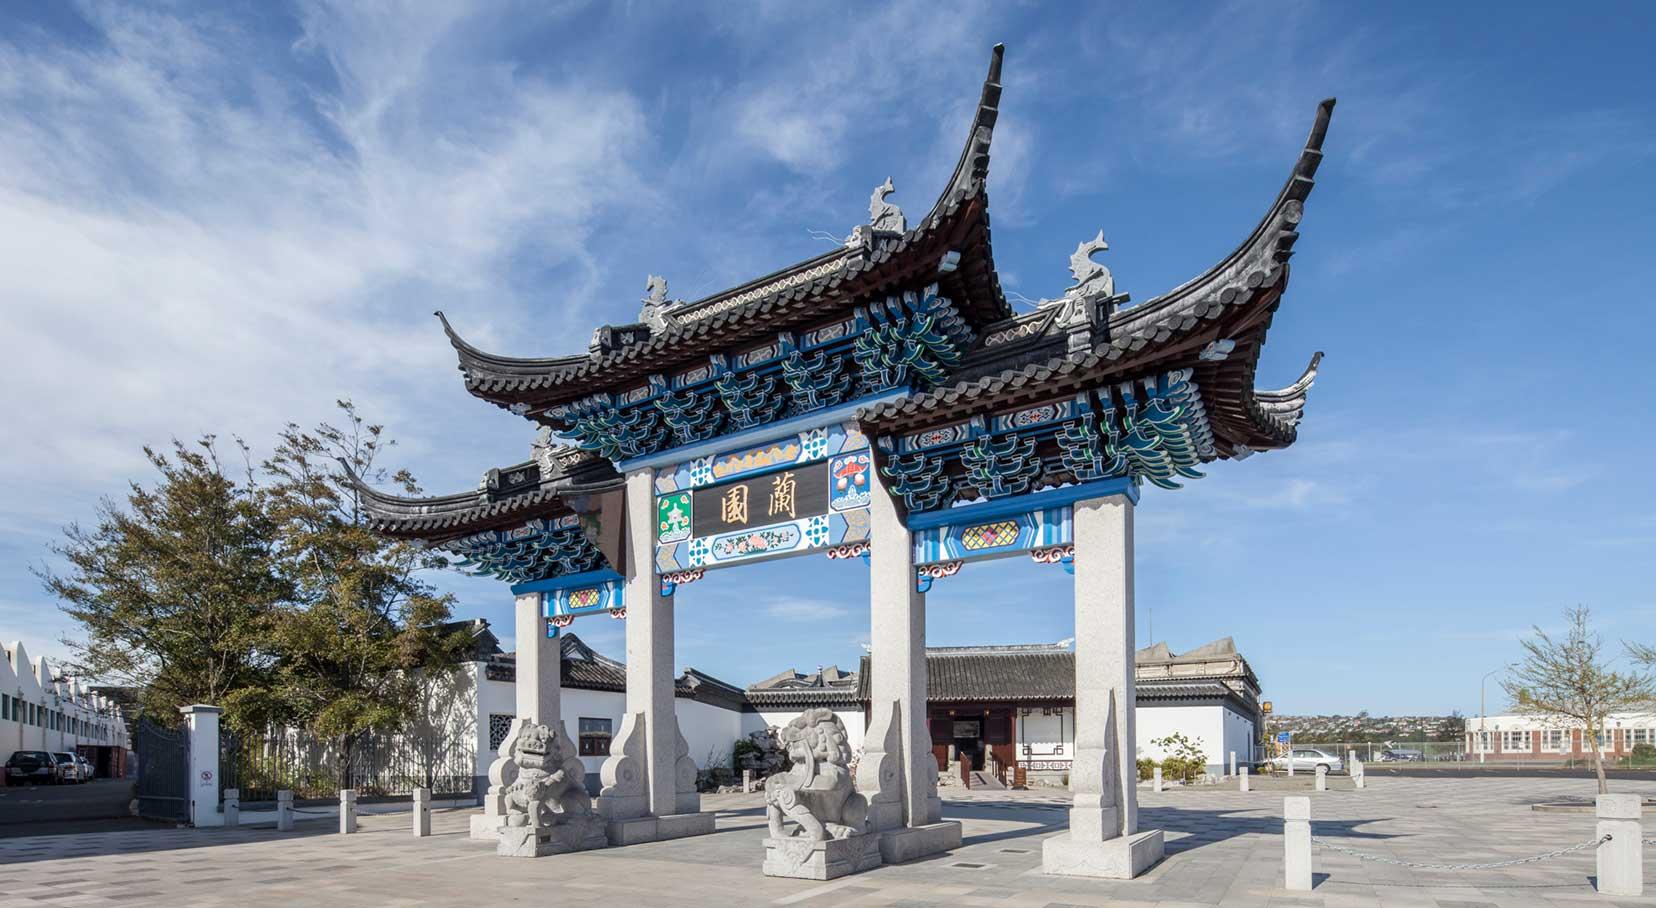 Dunedin Chinese Garden - Hours & location